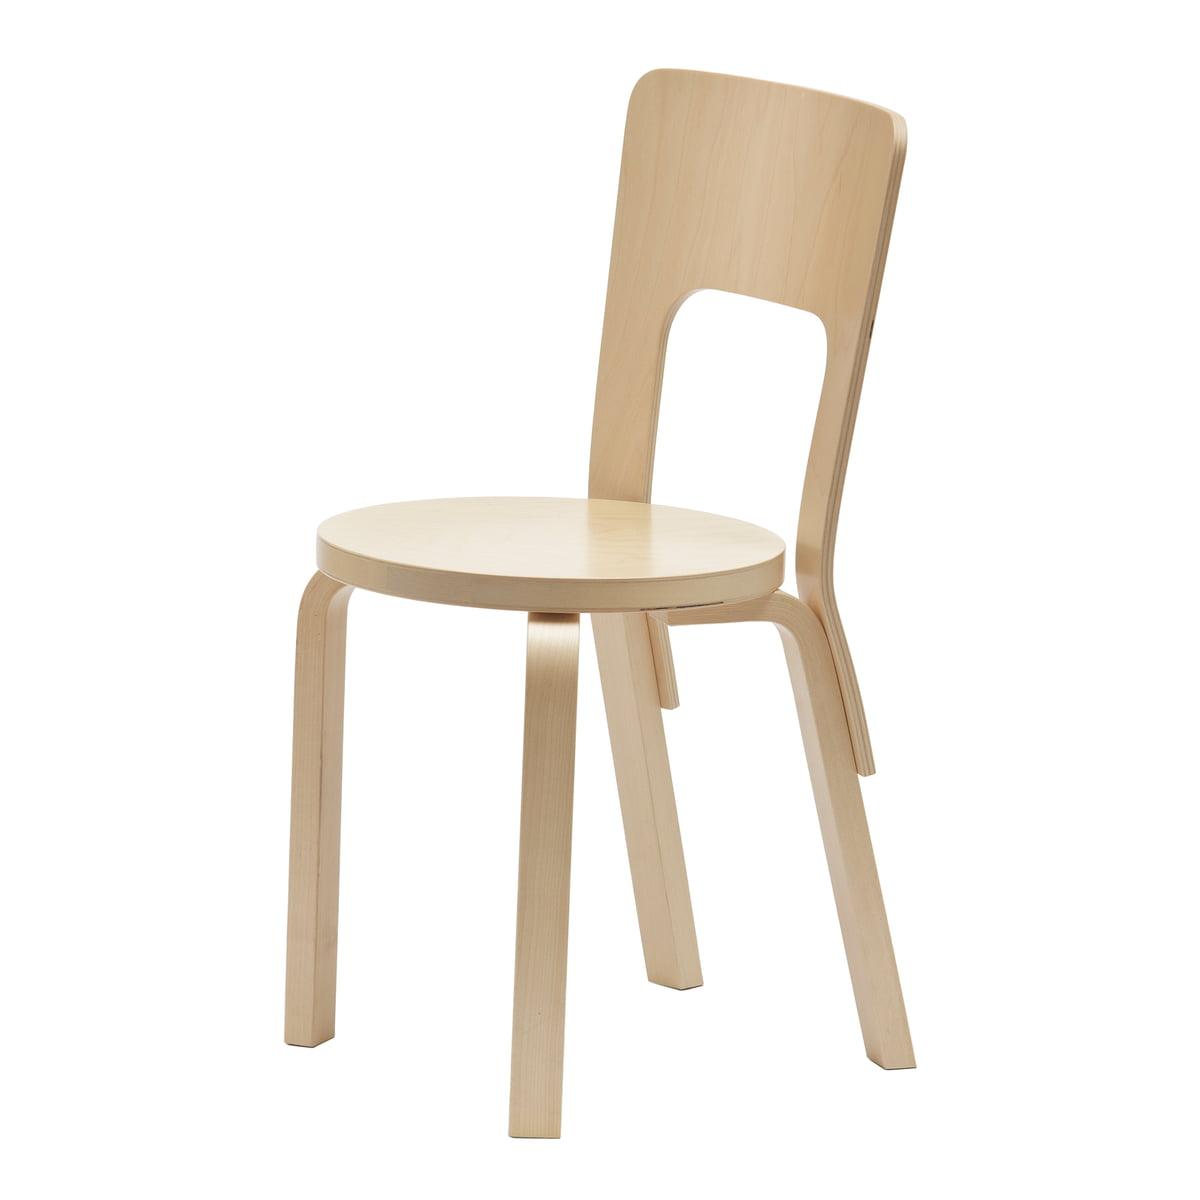 Artek Dress The Chair : Chair by artek in our shop